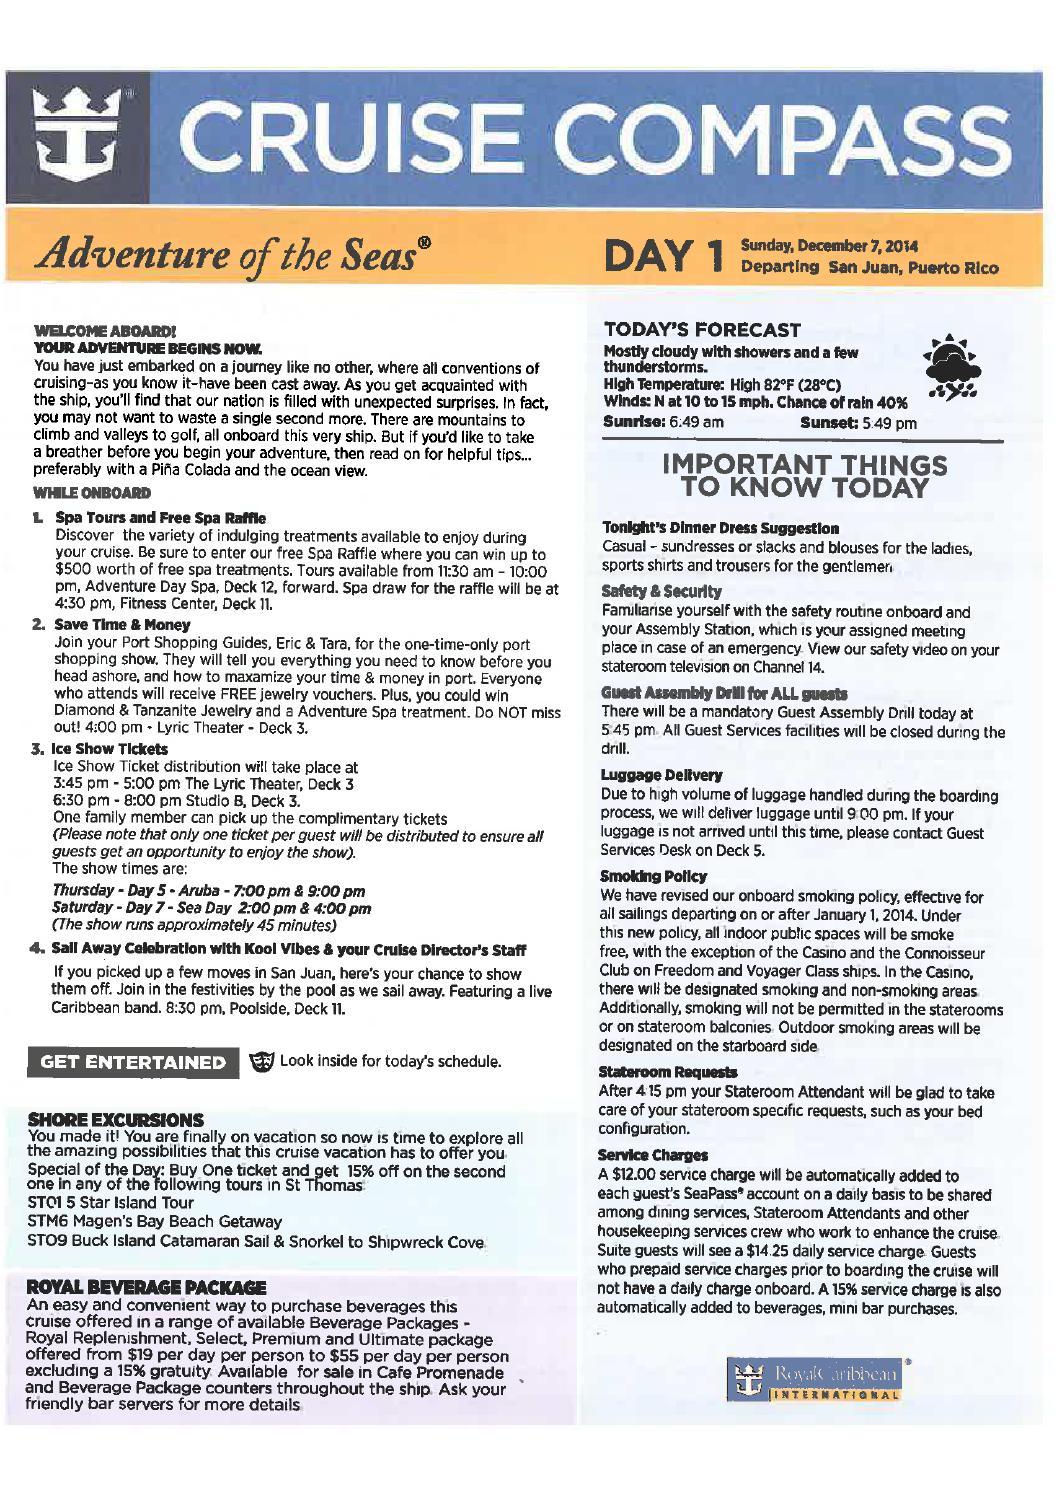 Adventure Of The Seas 7 Night Southern Caribbean Cruise